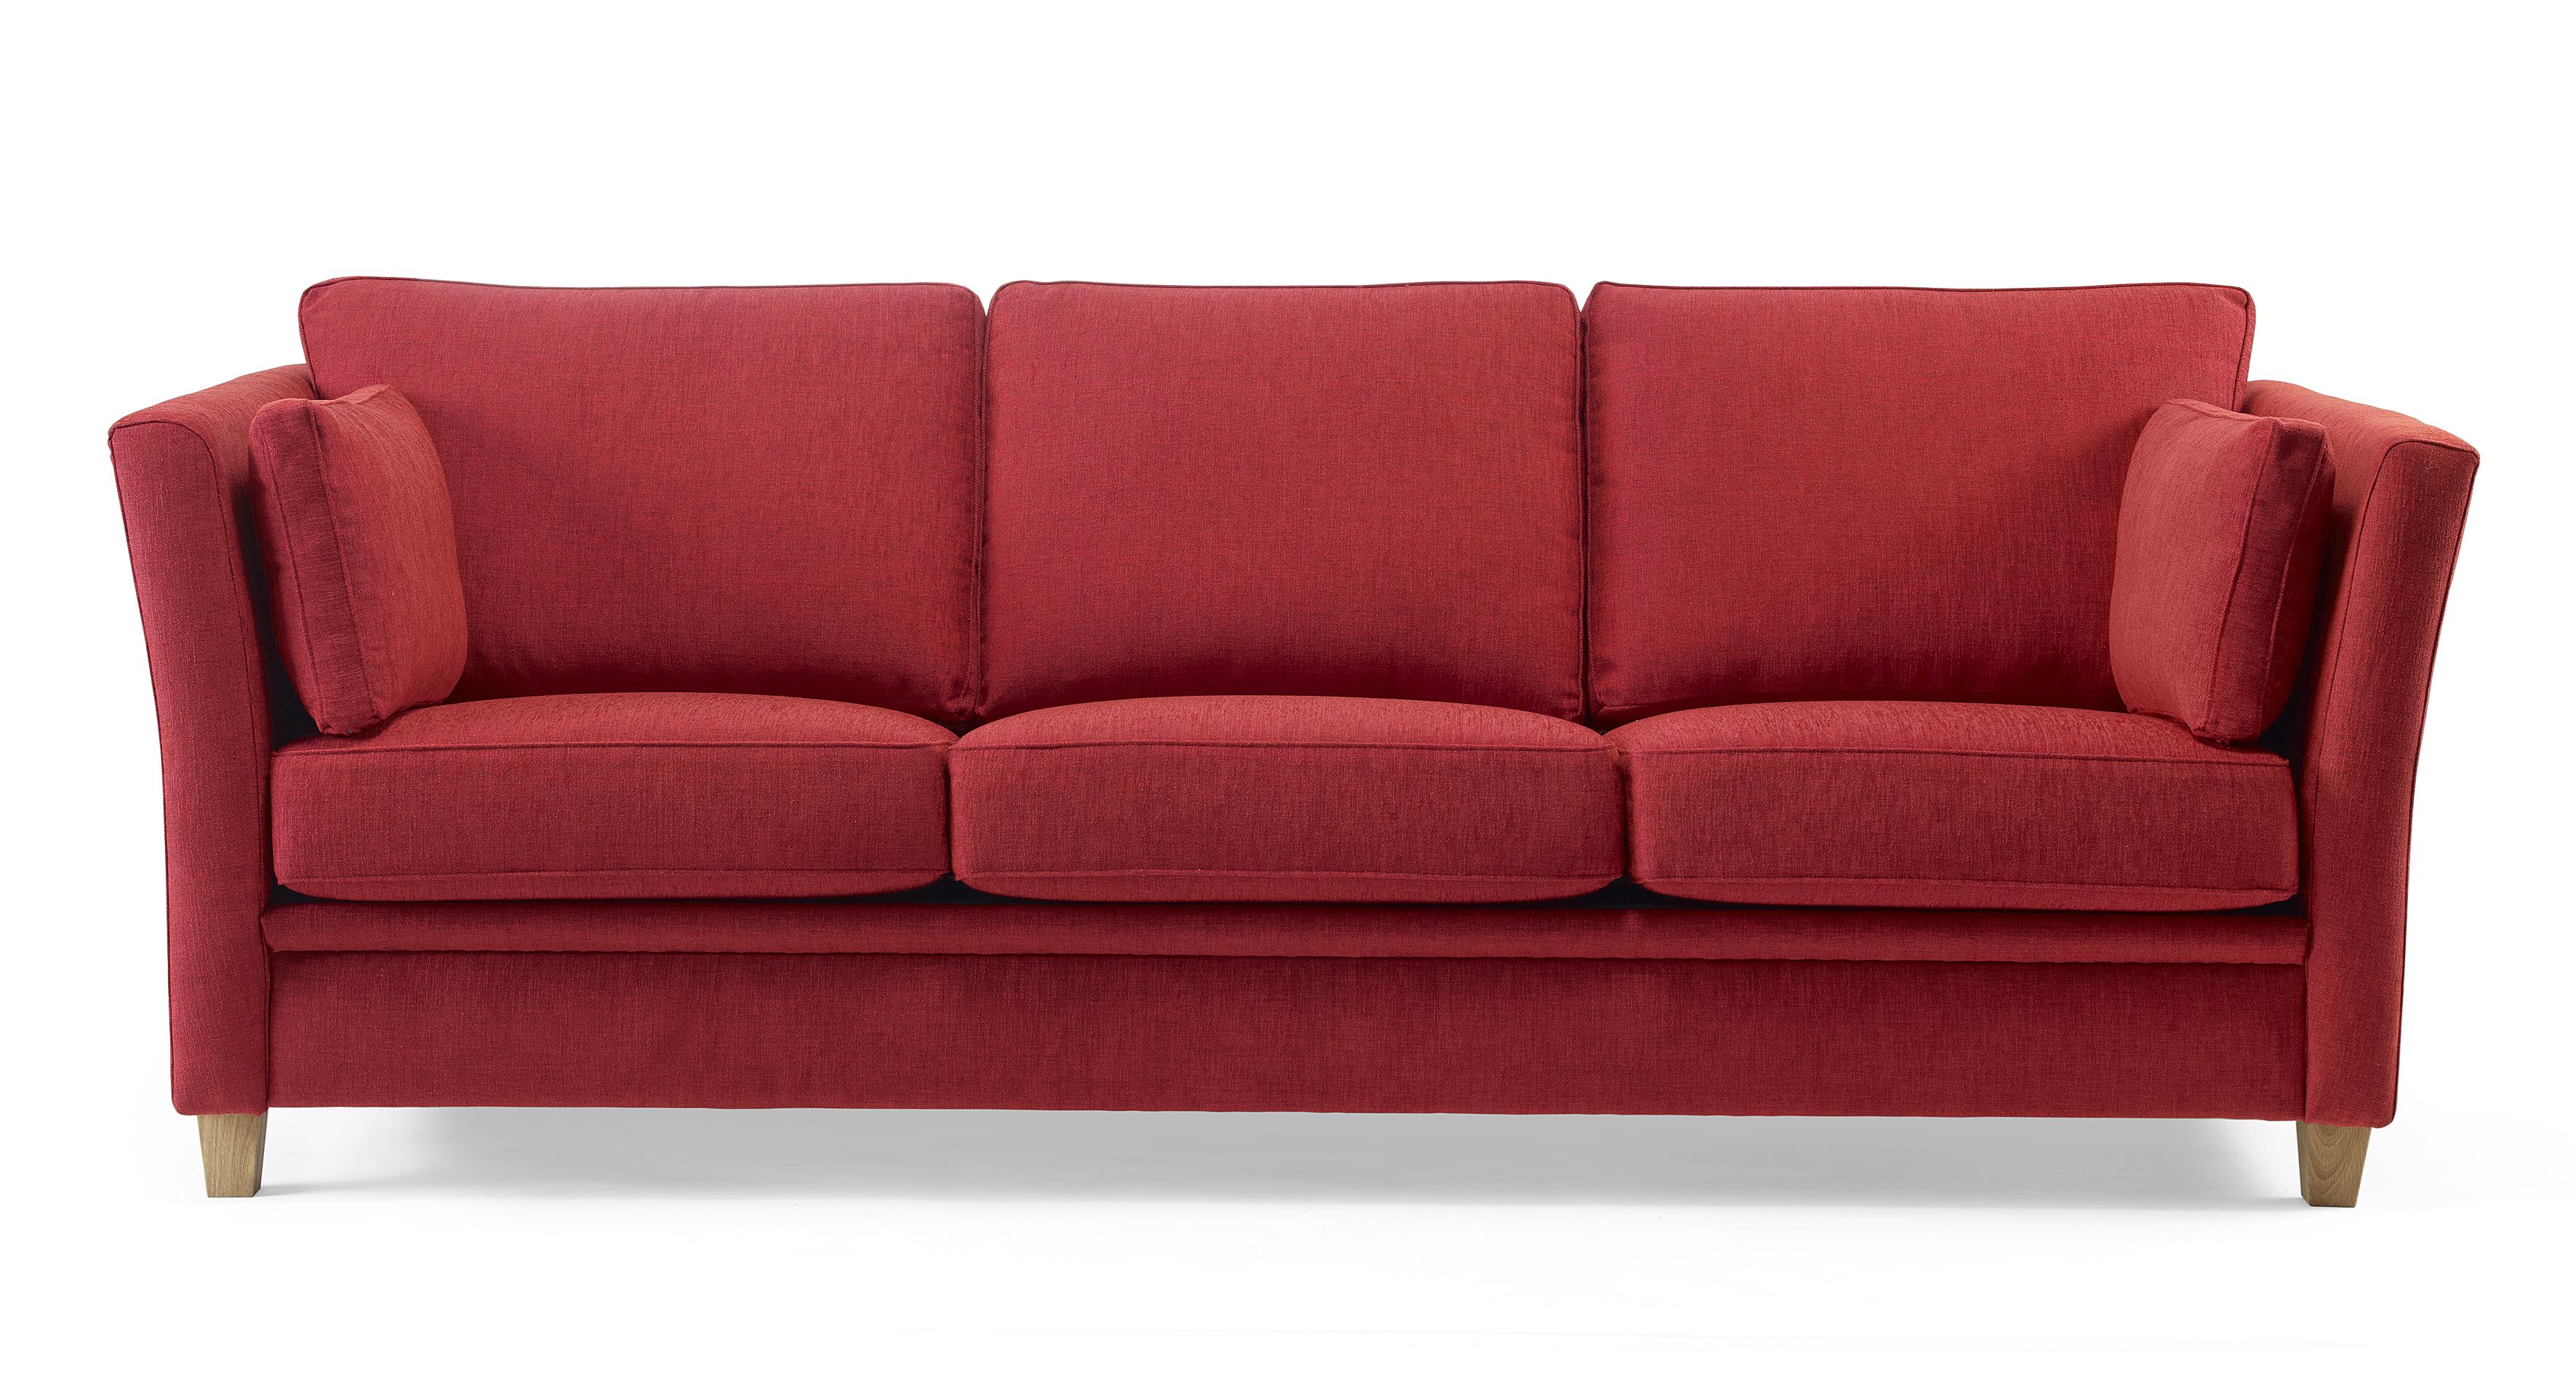 Möbelform Eros 3-sits soffa